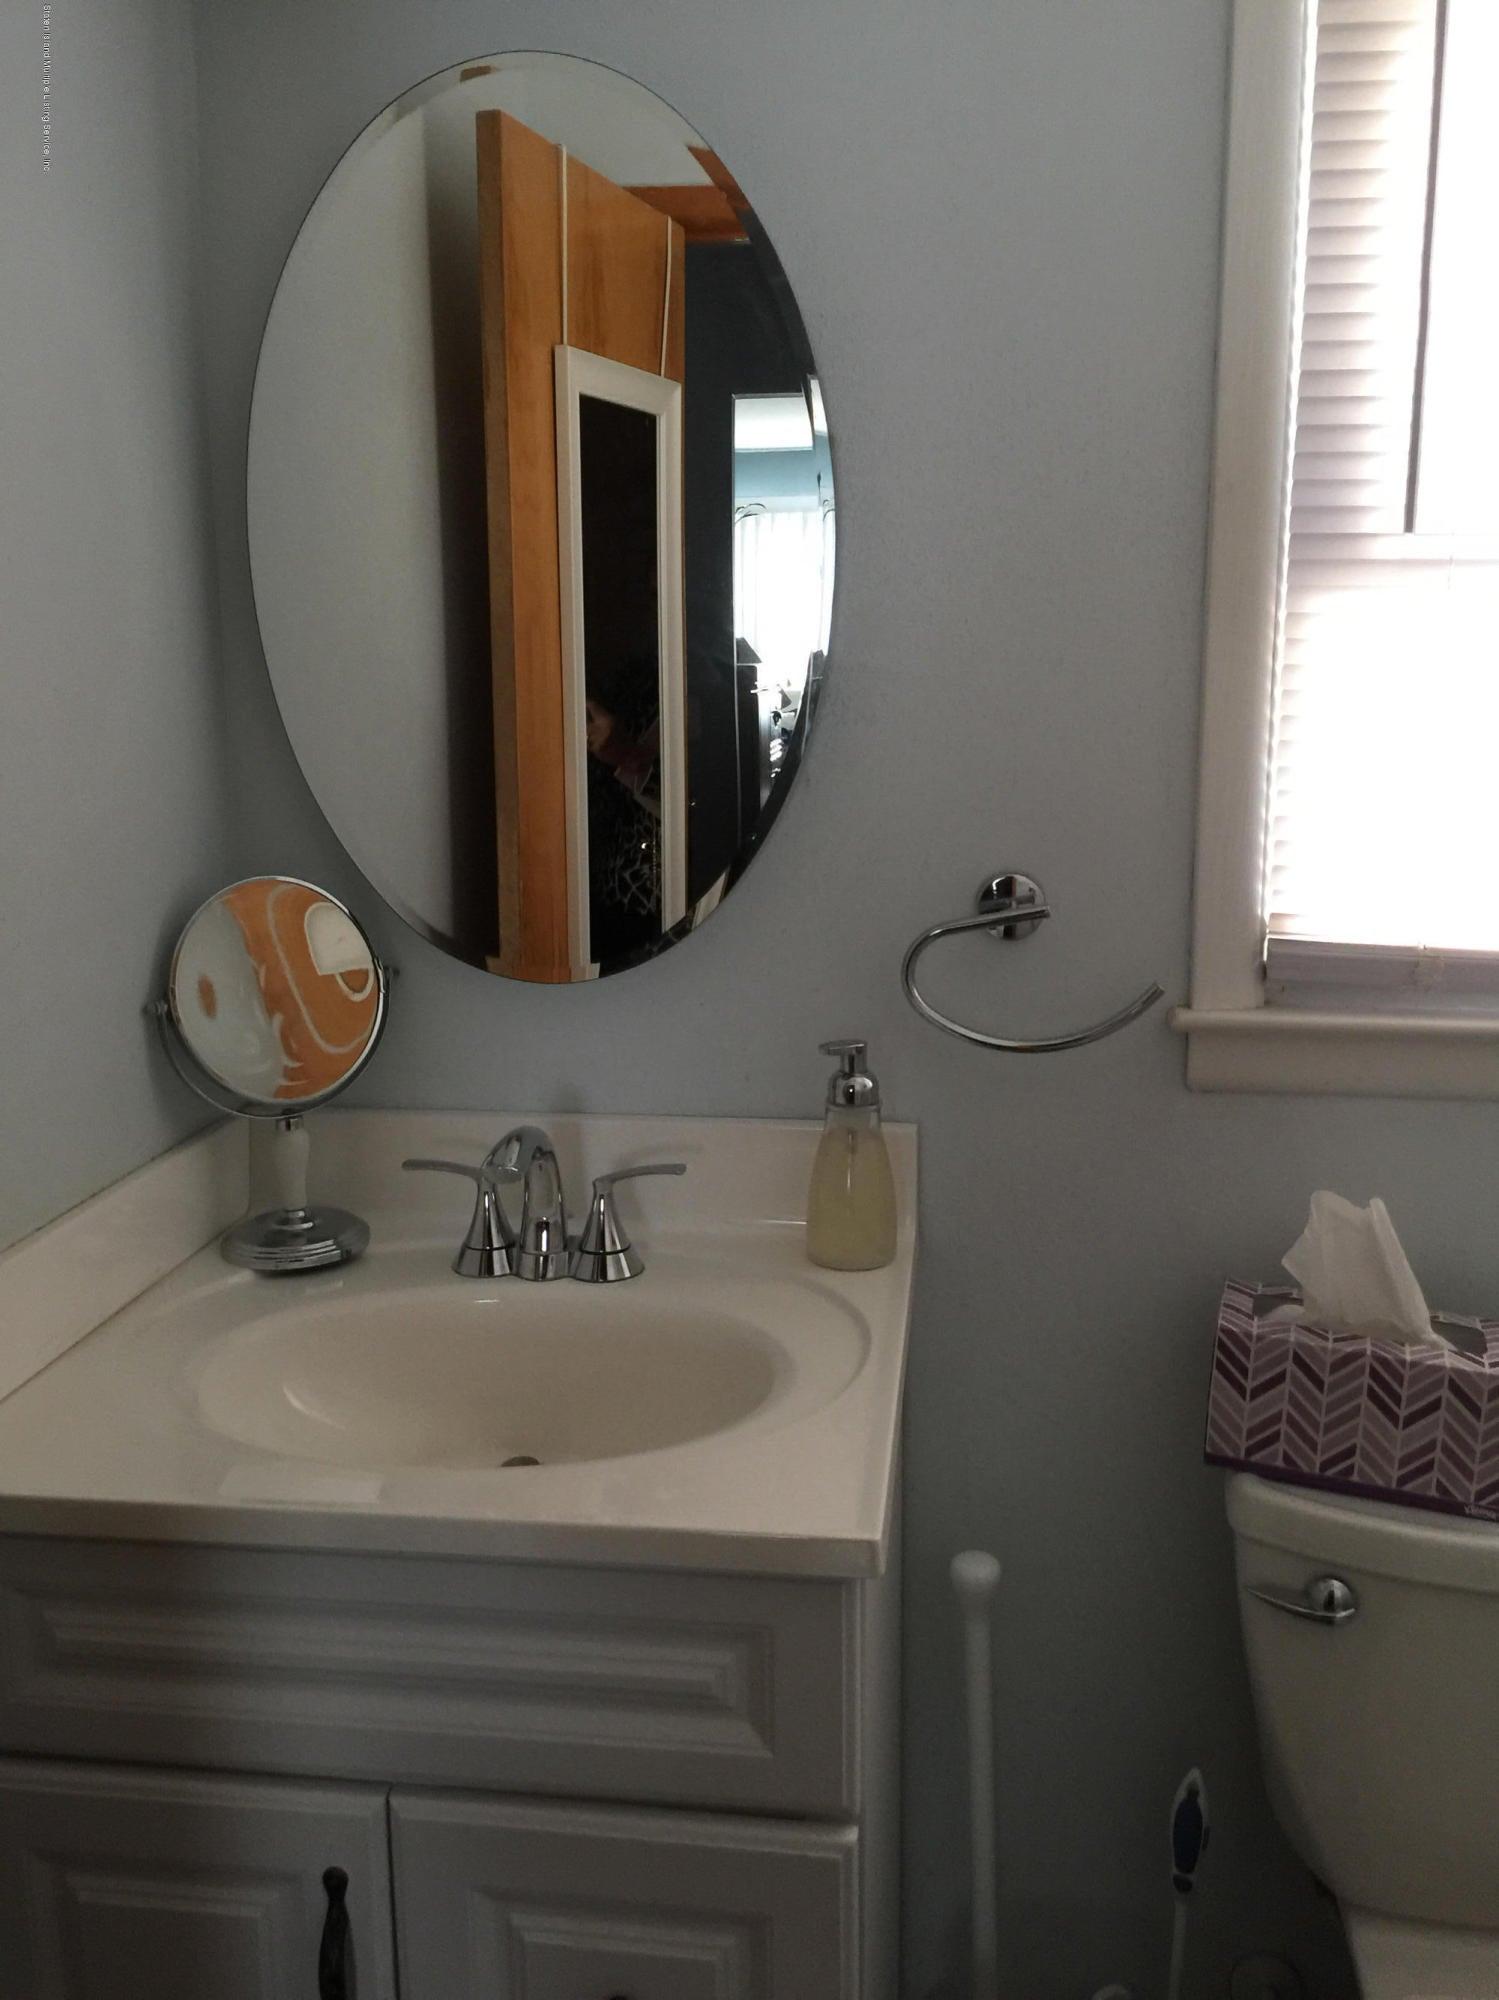 Single Family - Detached 108 Clarke Avenue  Staten Island, NY 10306, MLS-1106455-9